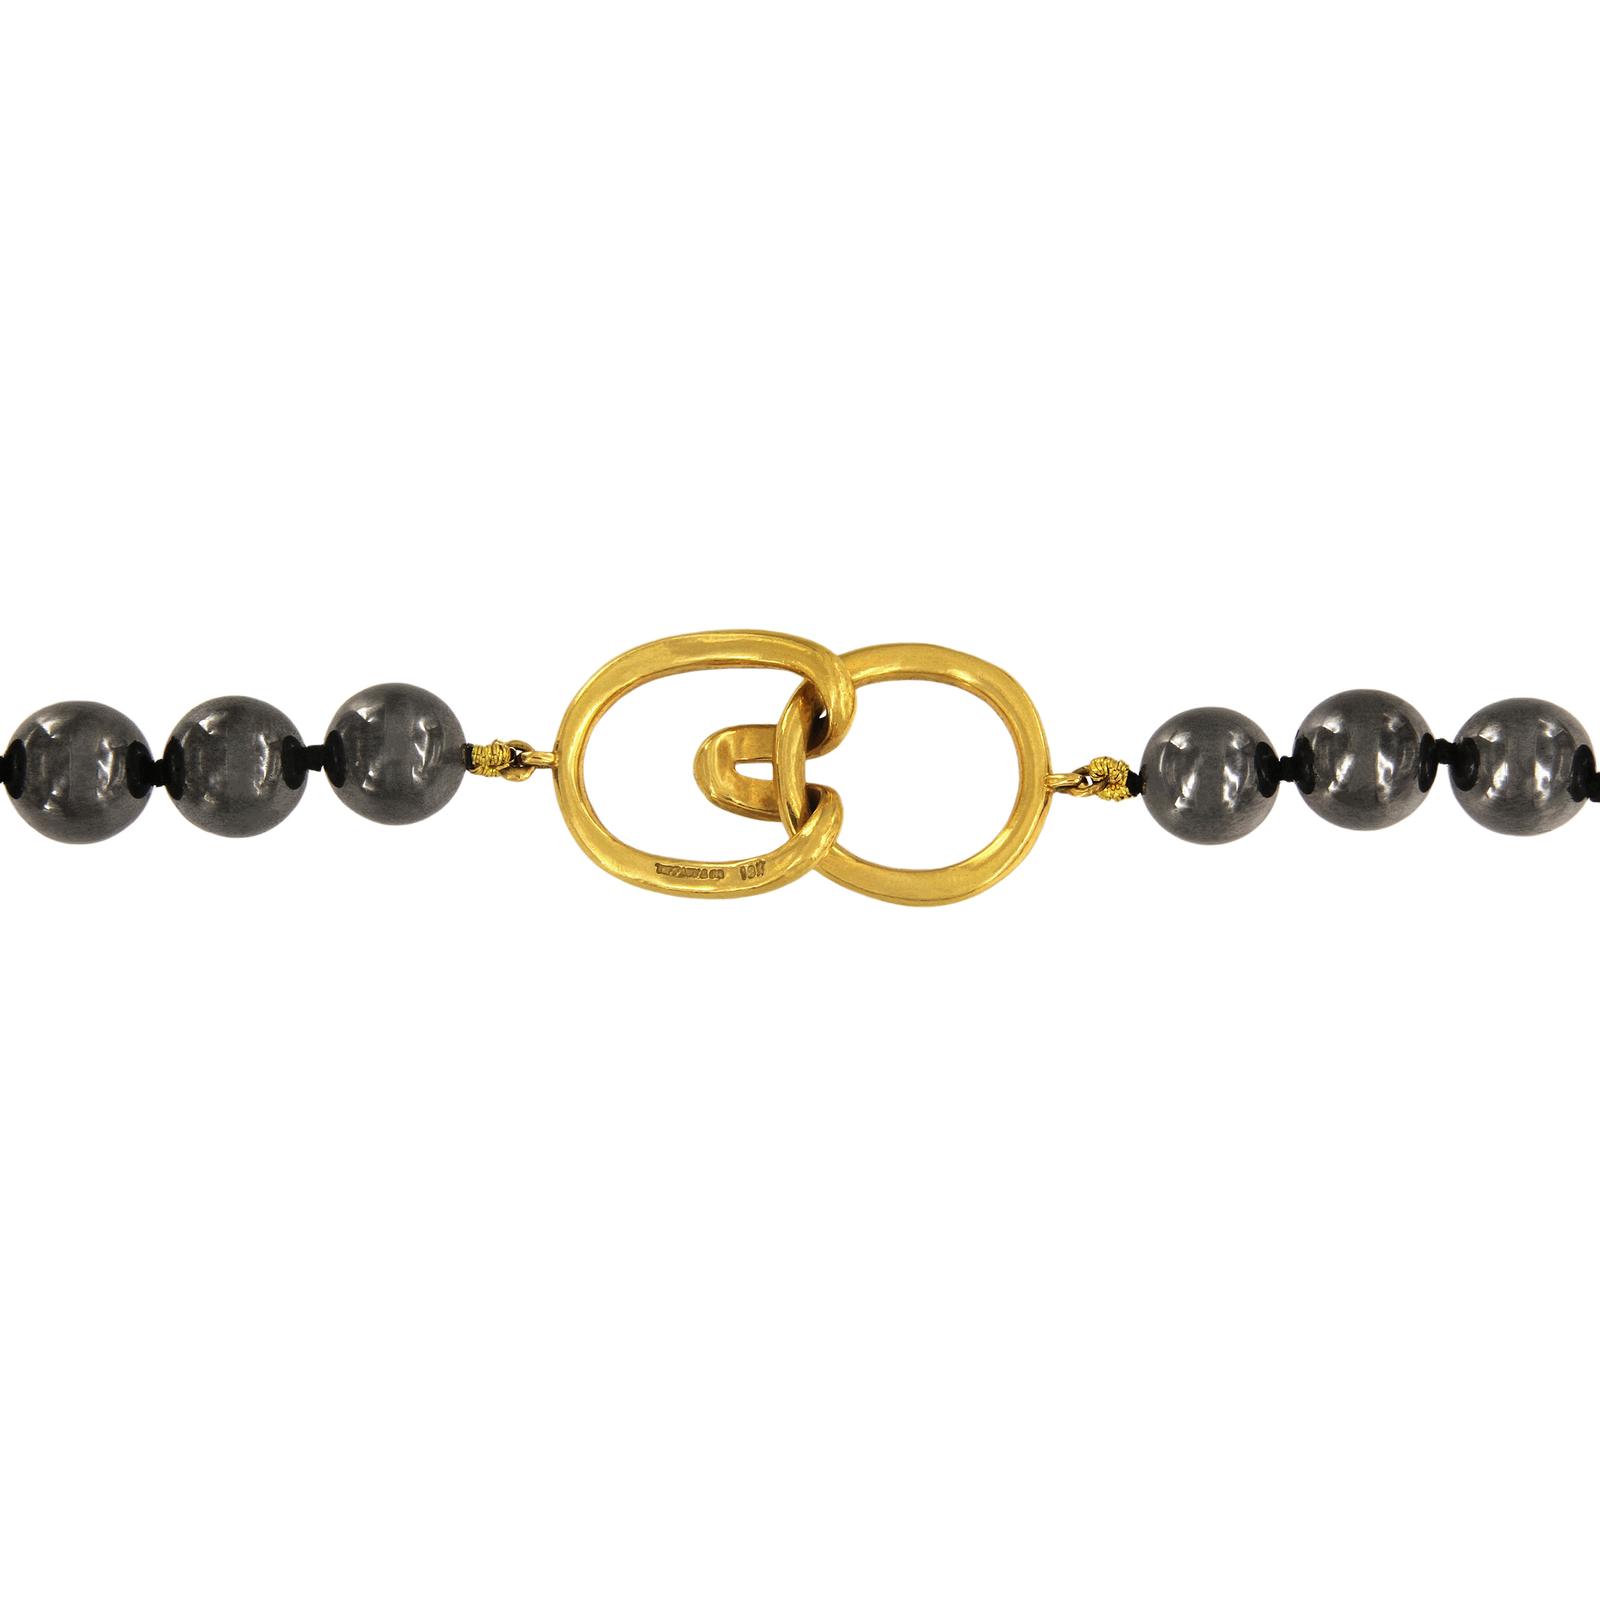 a92ea2a3c Rare TIFFANY & CO. 18K Yellow Gold & 8mm Black Onyx Round Bead 32